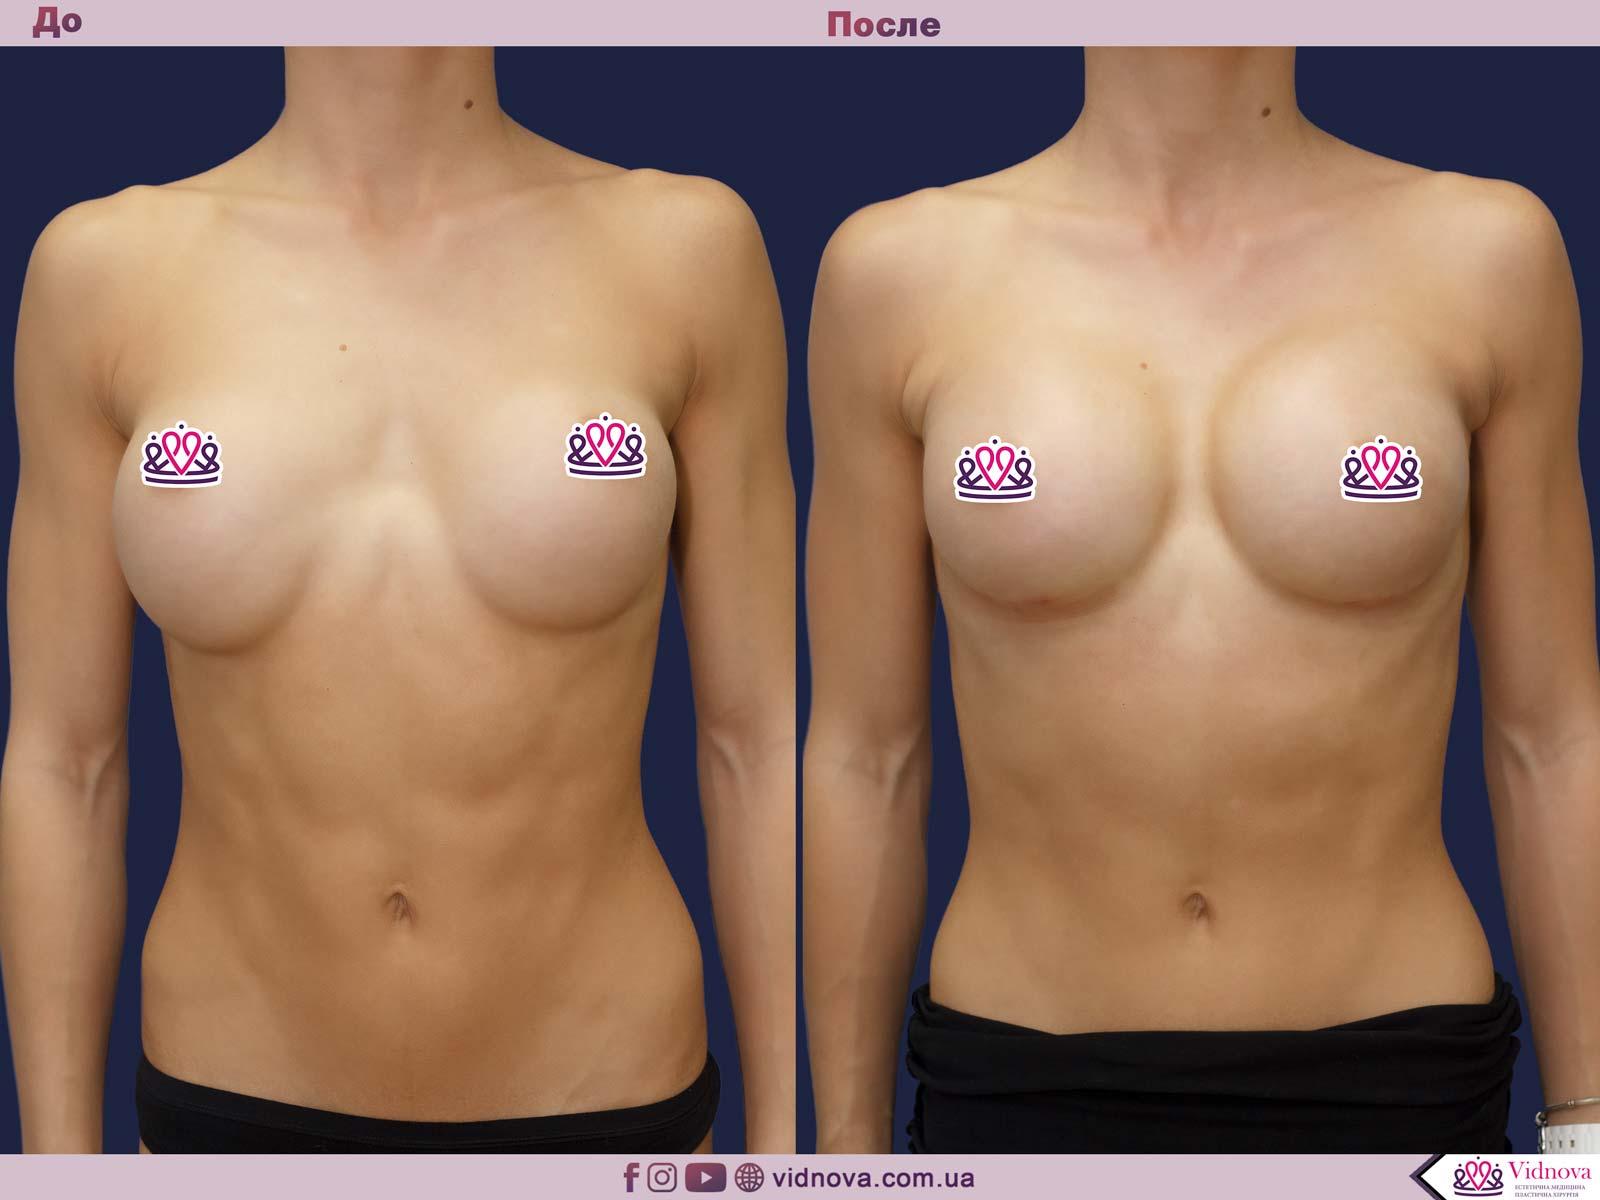 Увеличение груди: Фото ДО и ПОСЛЕ - Пример №58-1 - Клиника Vidnova